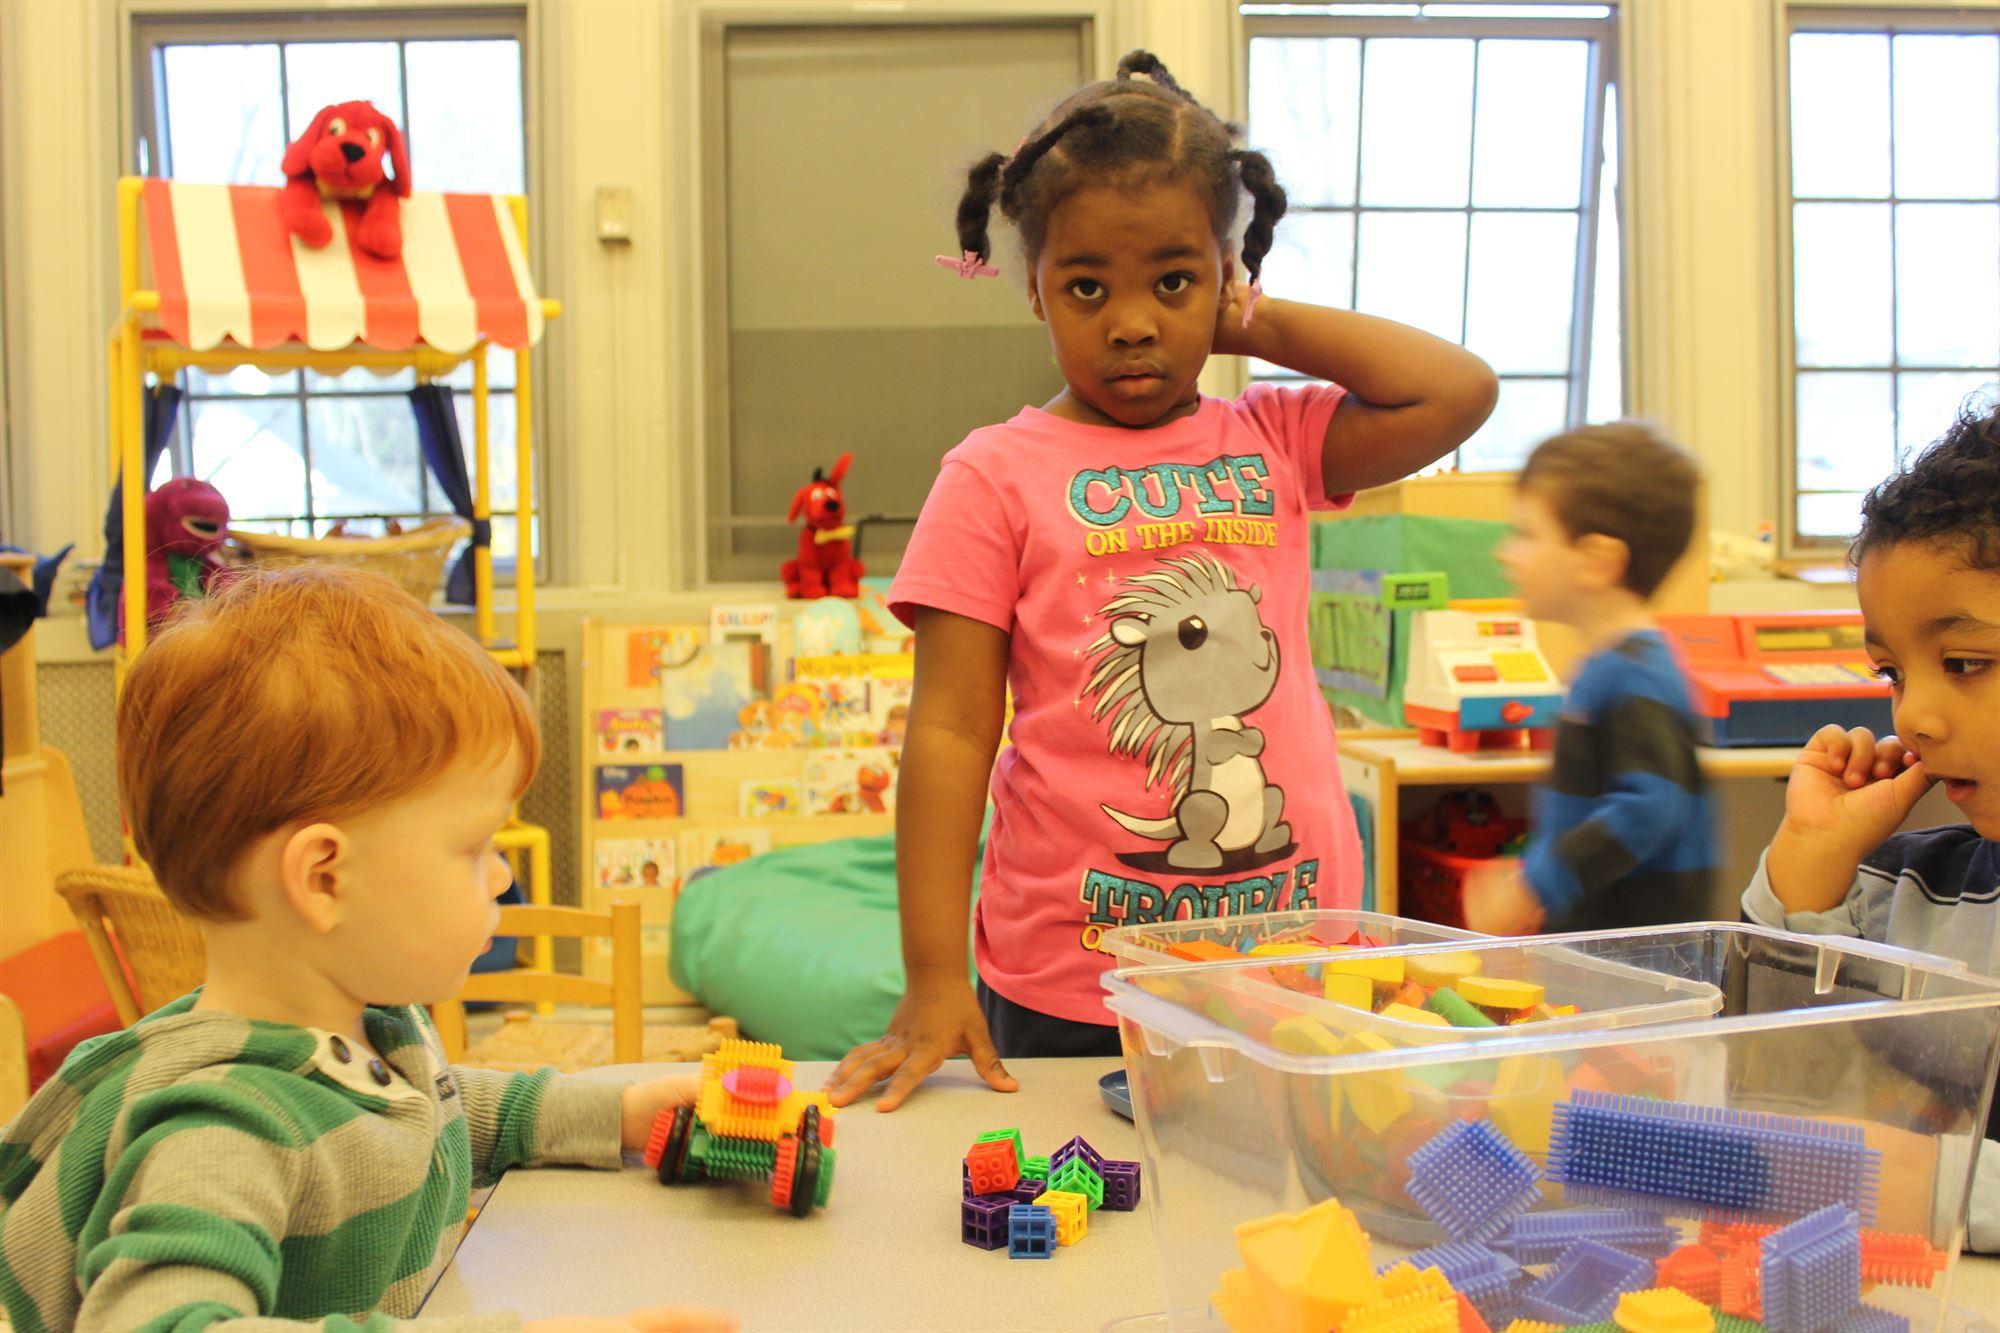 20 Providers To Participate In Preschool Open House Nov 14 At CHS